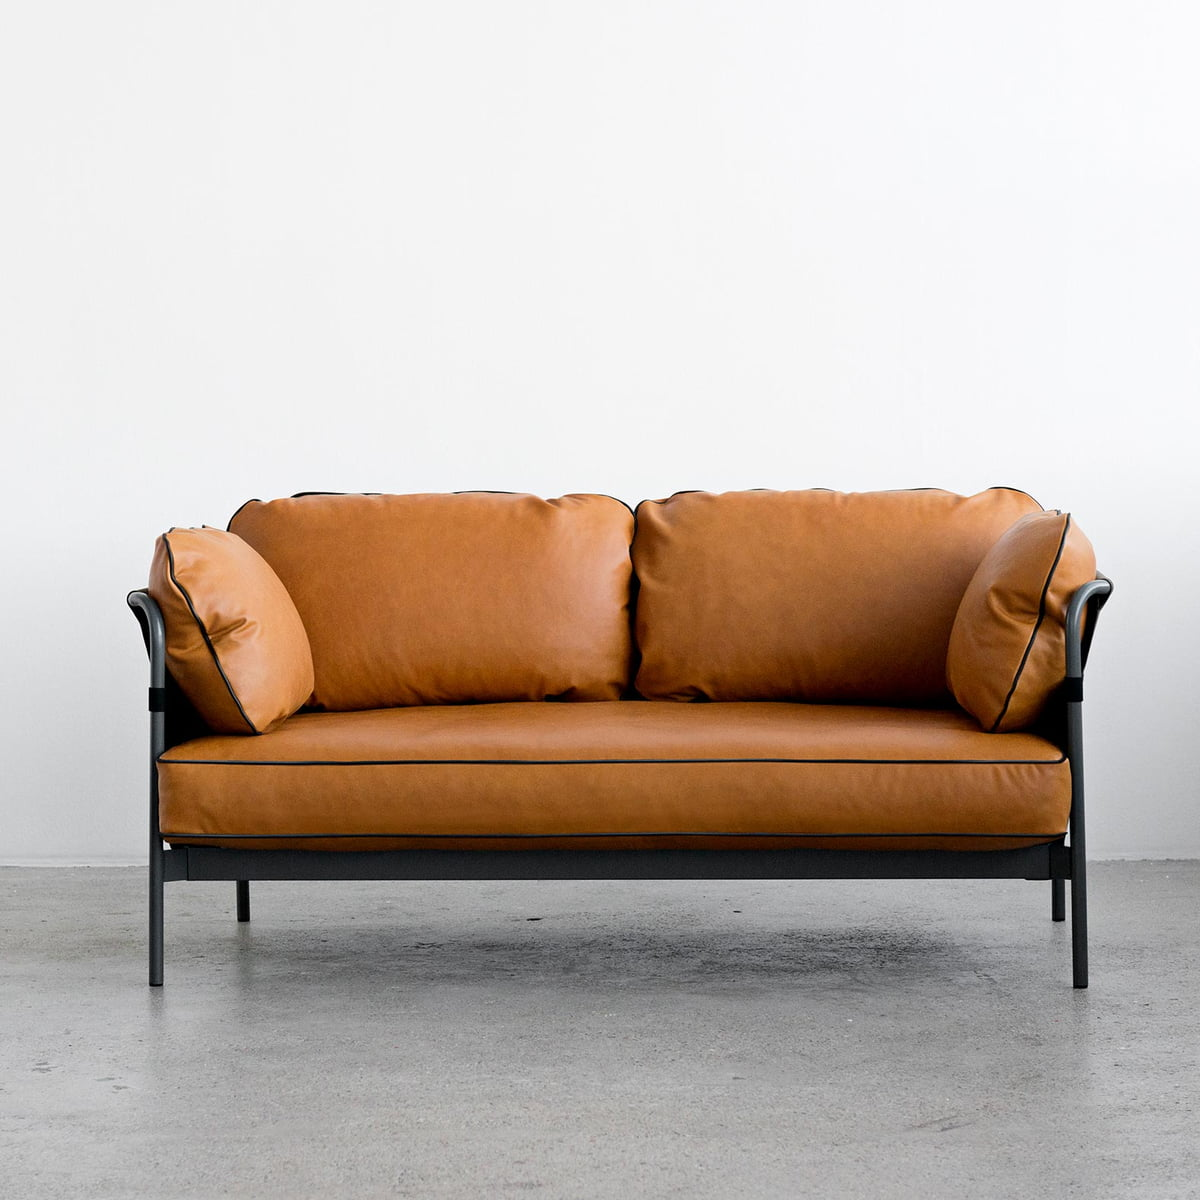 Full Size of Can Sofa 2 Sitzer Von Hay Connox Altes Recamiere L Form Mit Abnehmbaren Bezug Schillig 3 Spannbezug Cognac Riess Ambiente Grau Stoff Lederpflege Kunstleder Sofa Sofa Cognac